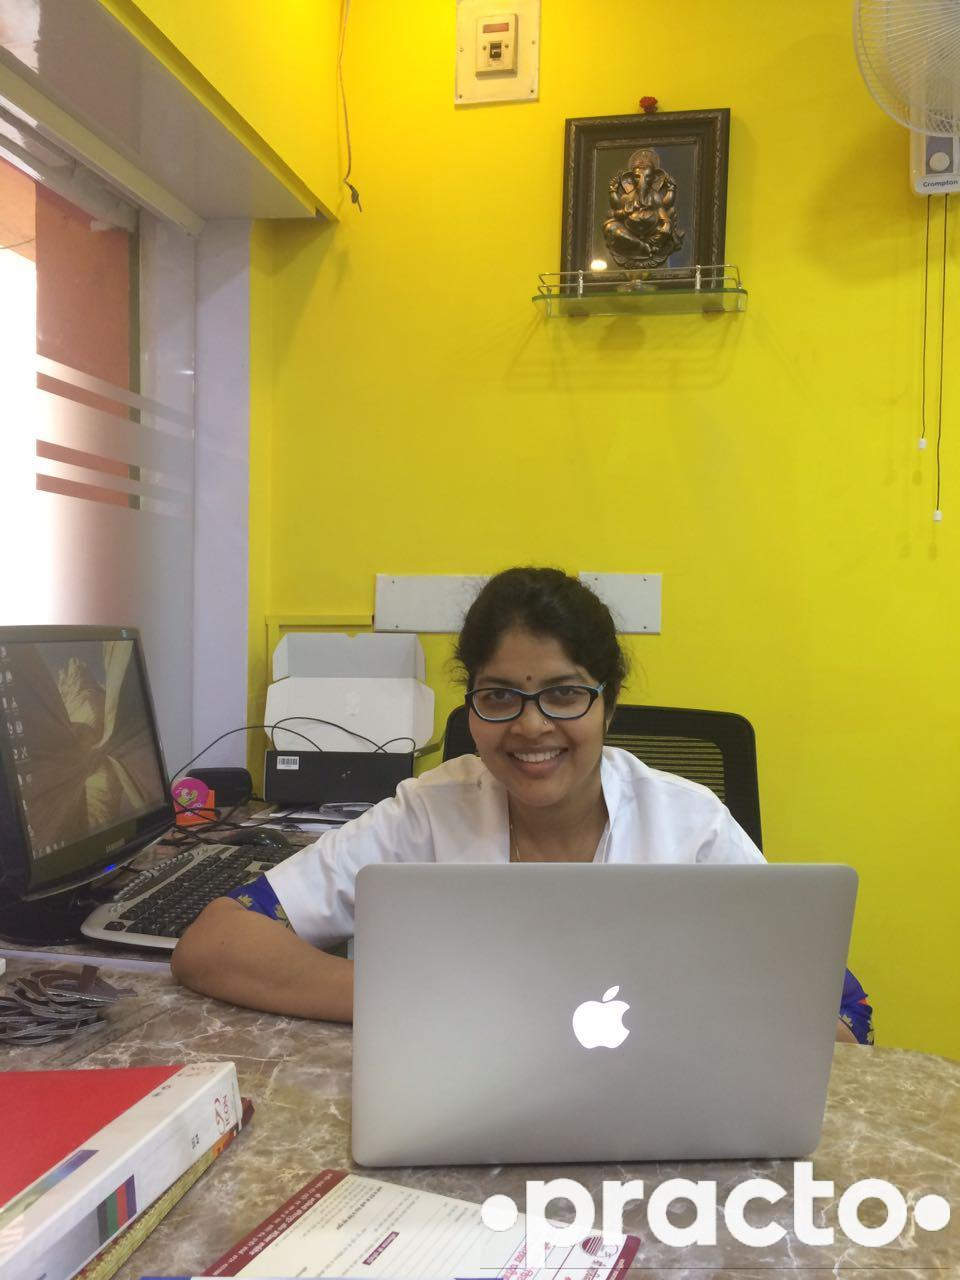 Dr. Anita Mishra